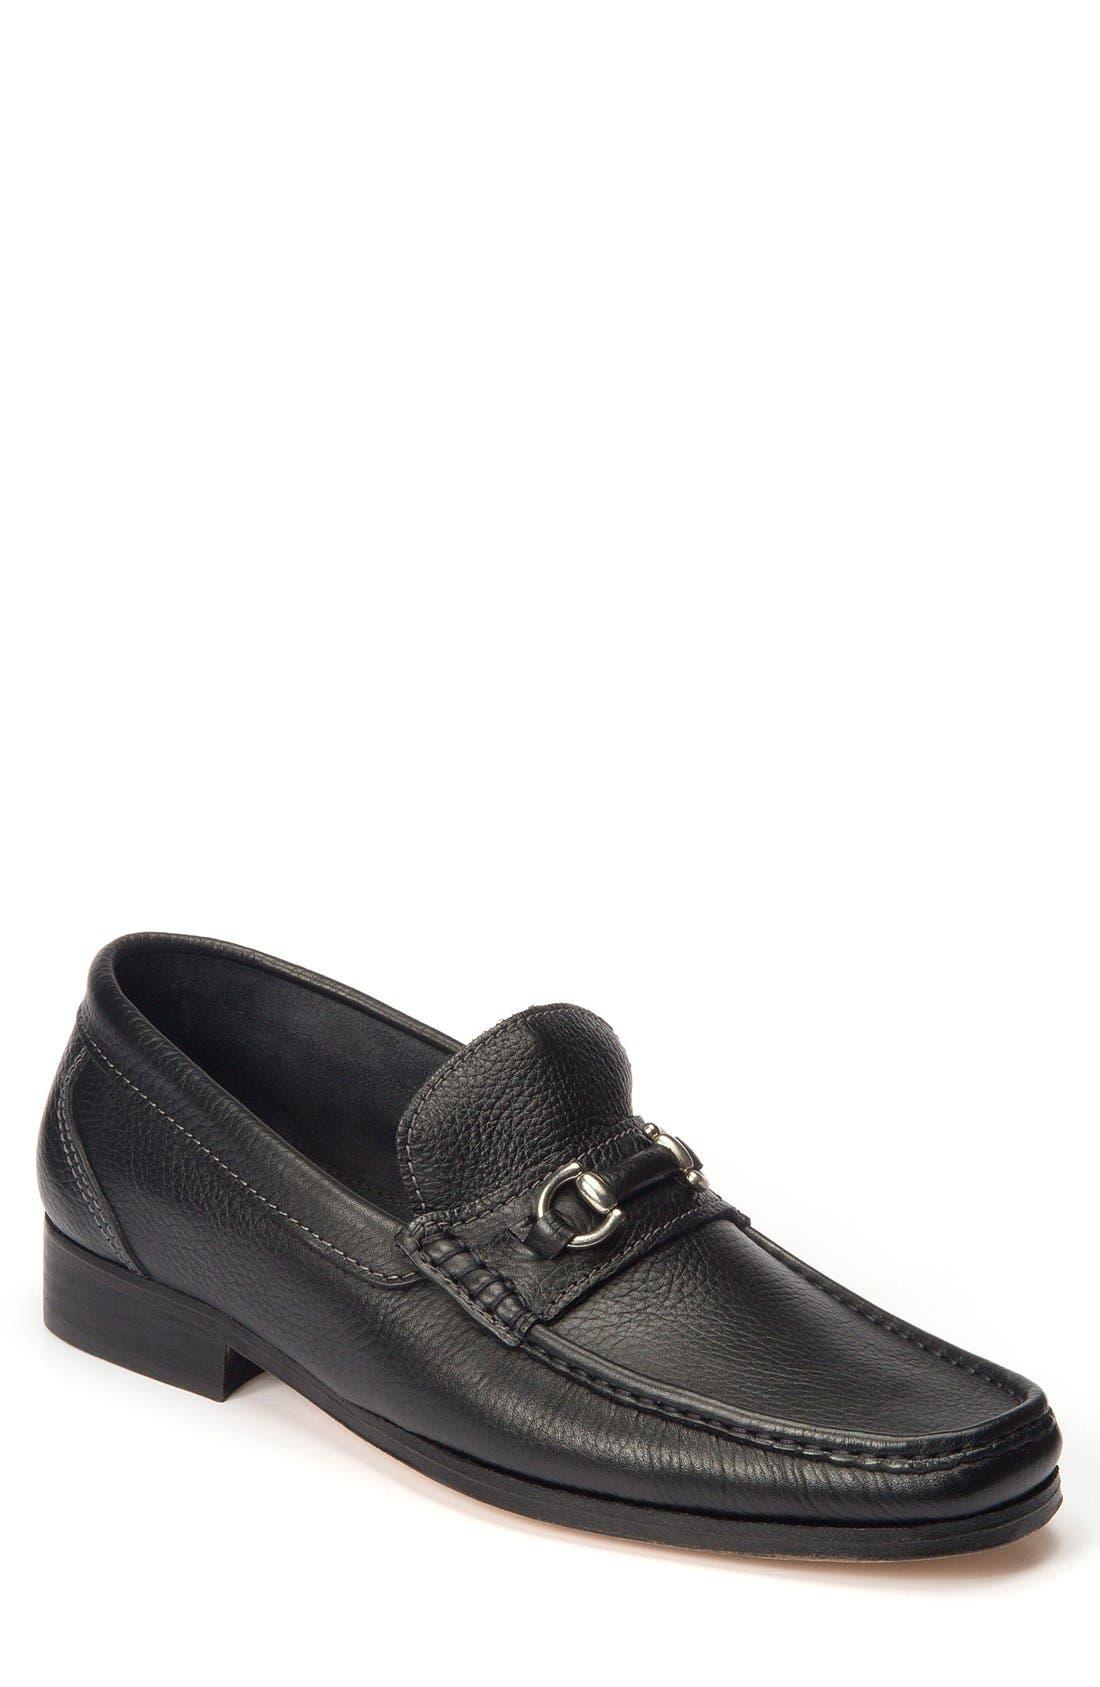 Garda Bit Loafer,                             Main thumbnail 1, color,                             Black Leather